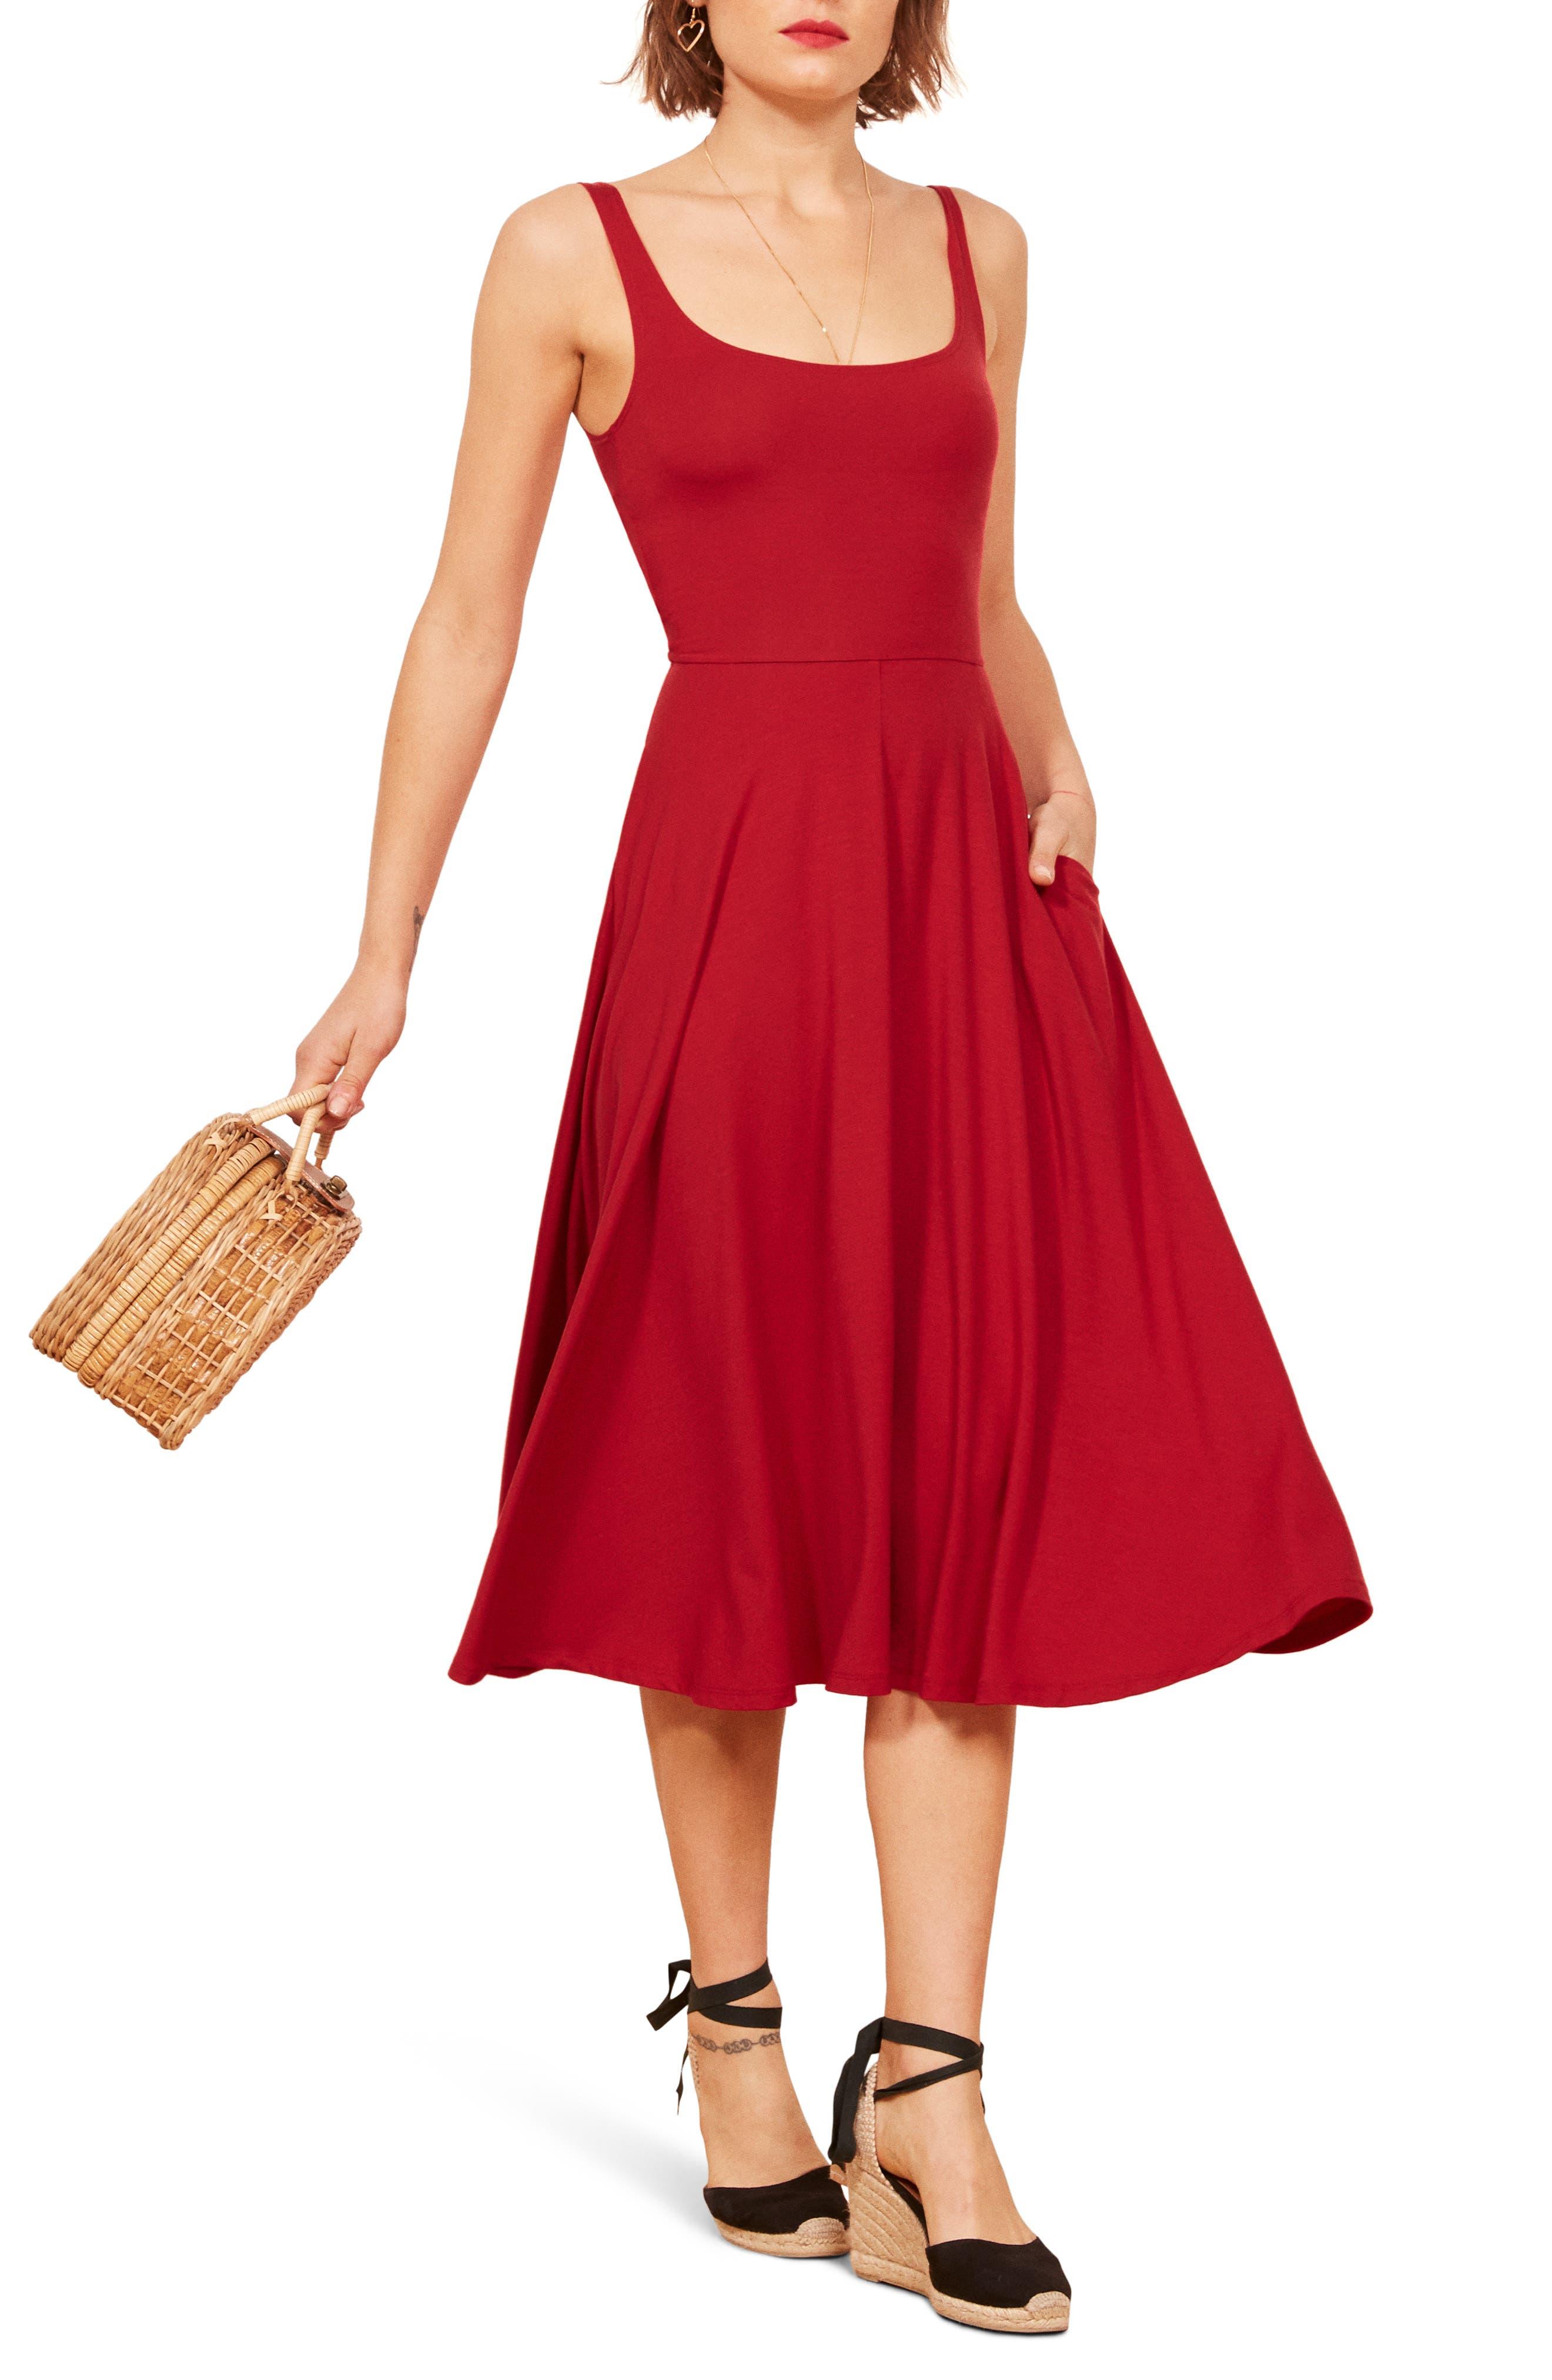 REFORMATION, Rou Midi Fit & Flare Dress, Main thumbnail 1, color, CHERRY